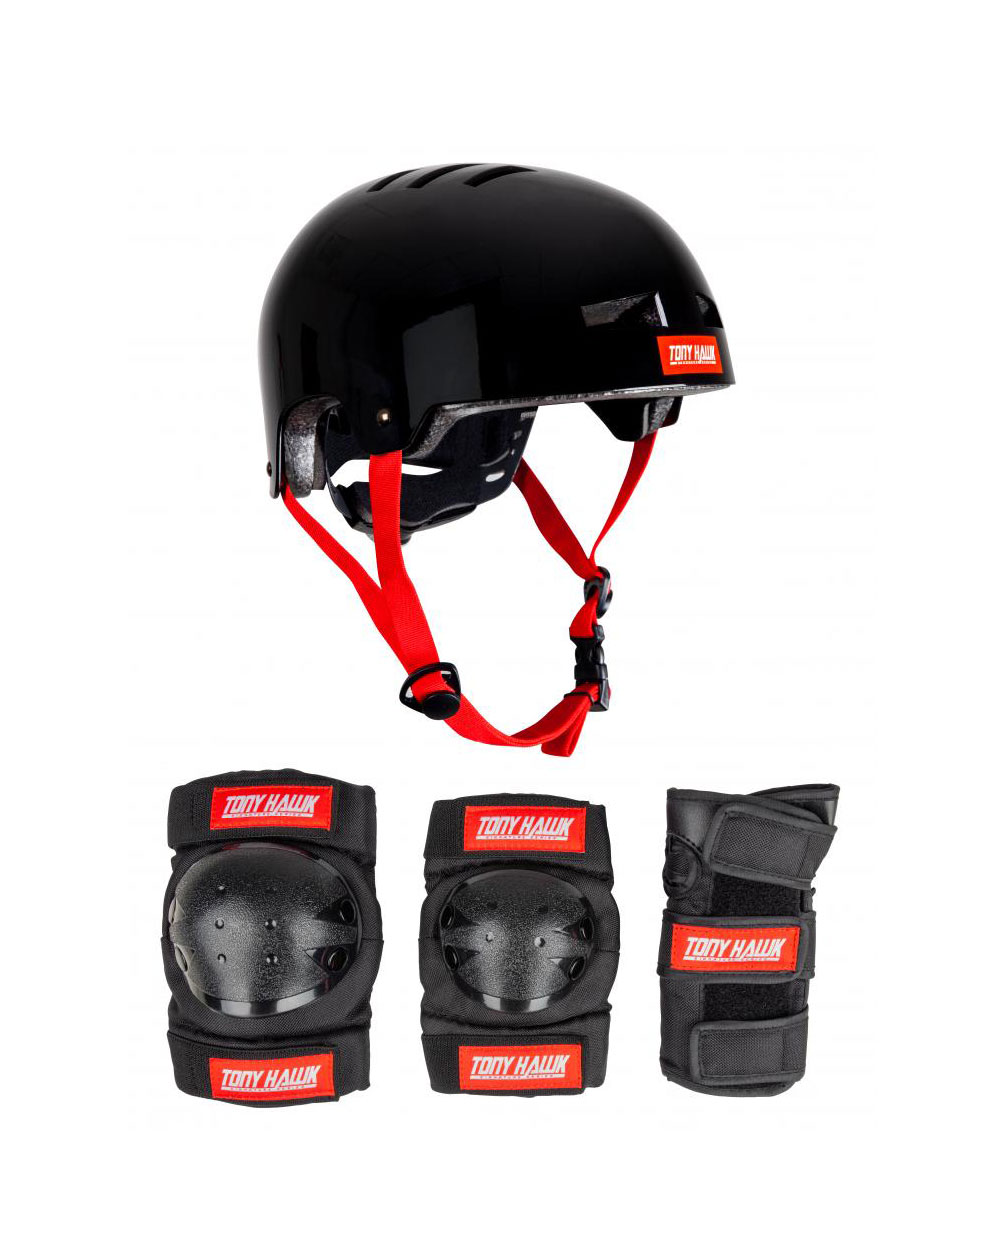 Tony Hawk Junior Protective Set Skateboard Pad Set Black/Red